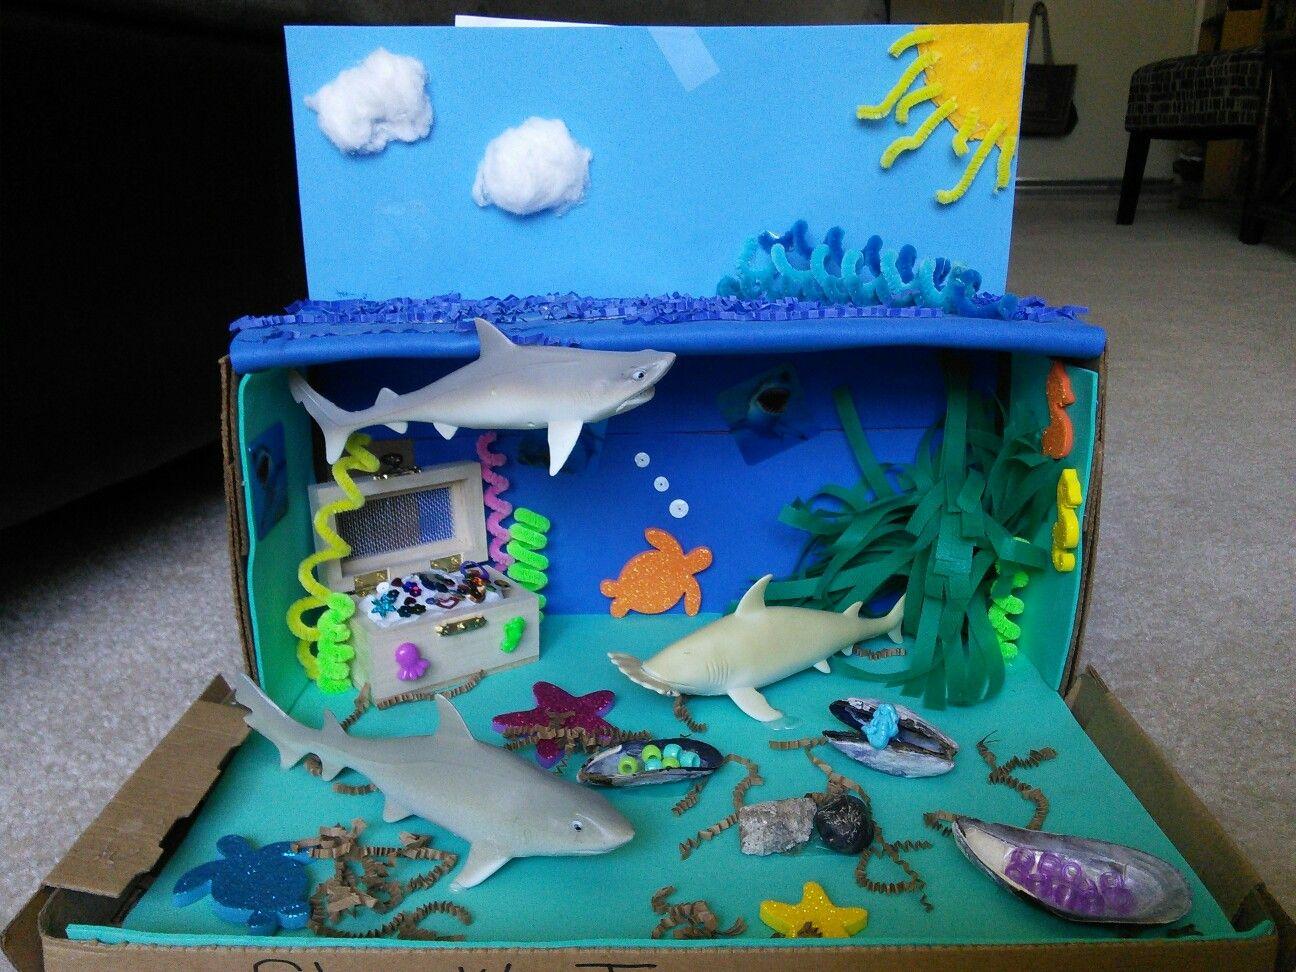 Kids Diorama With Details: Shark Diorama, Underwater Diorama, 3 Layer Diorama